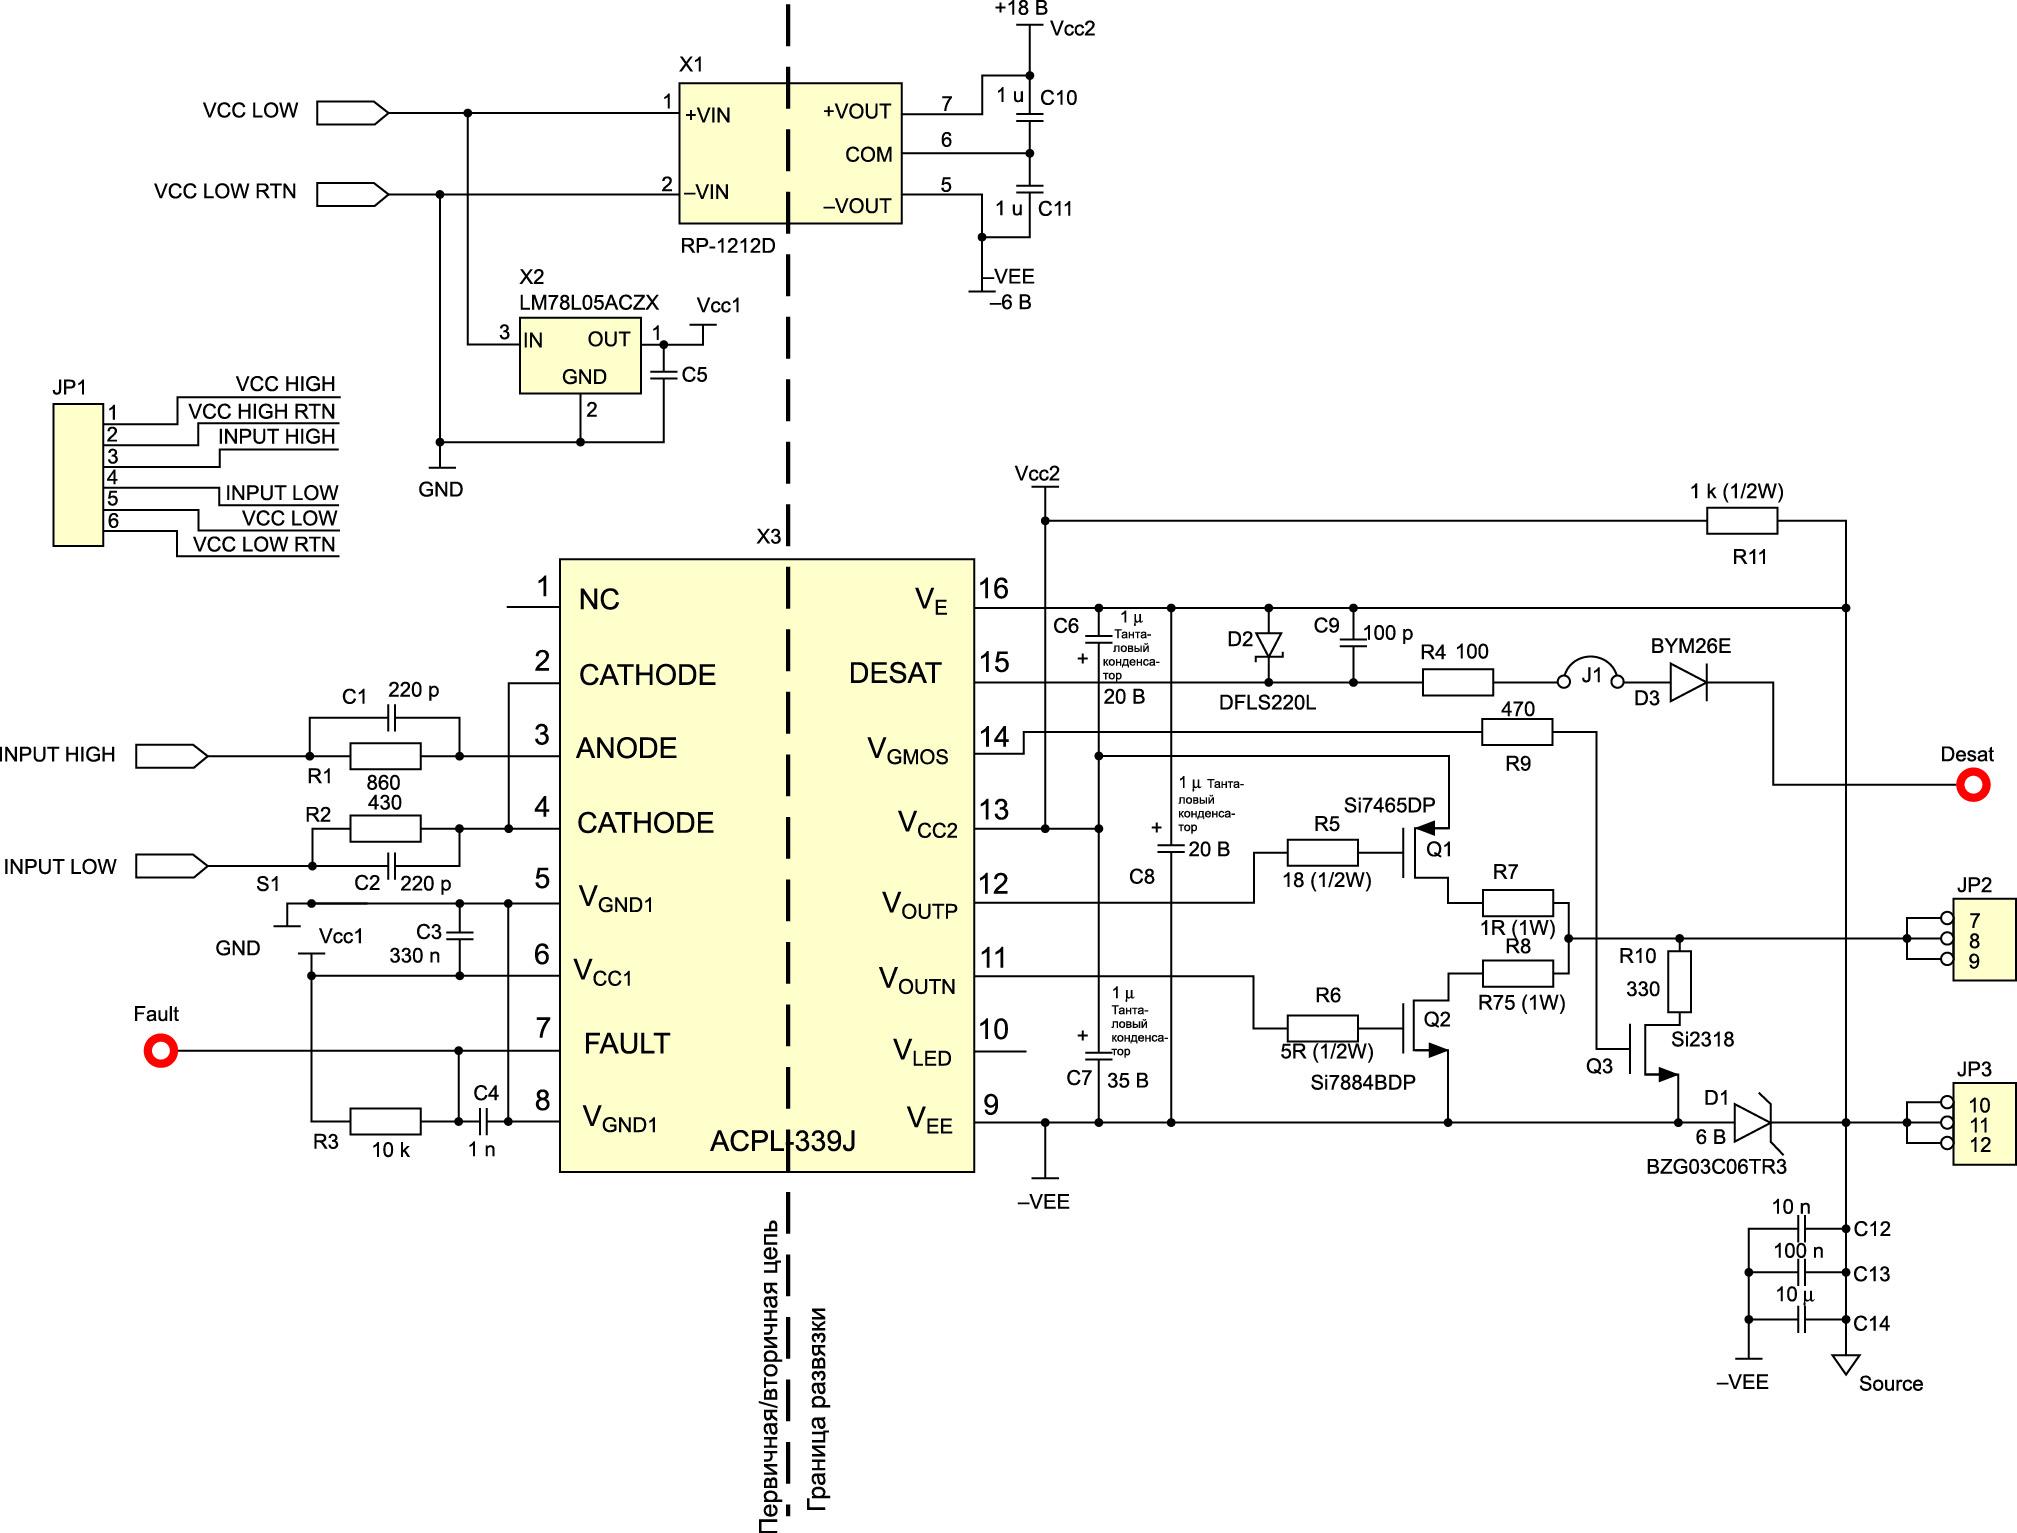 Электрическая схема исходного проекта на базе ACPL-339J и SiC MOSFET от Cree